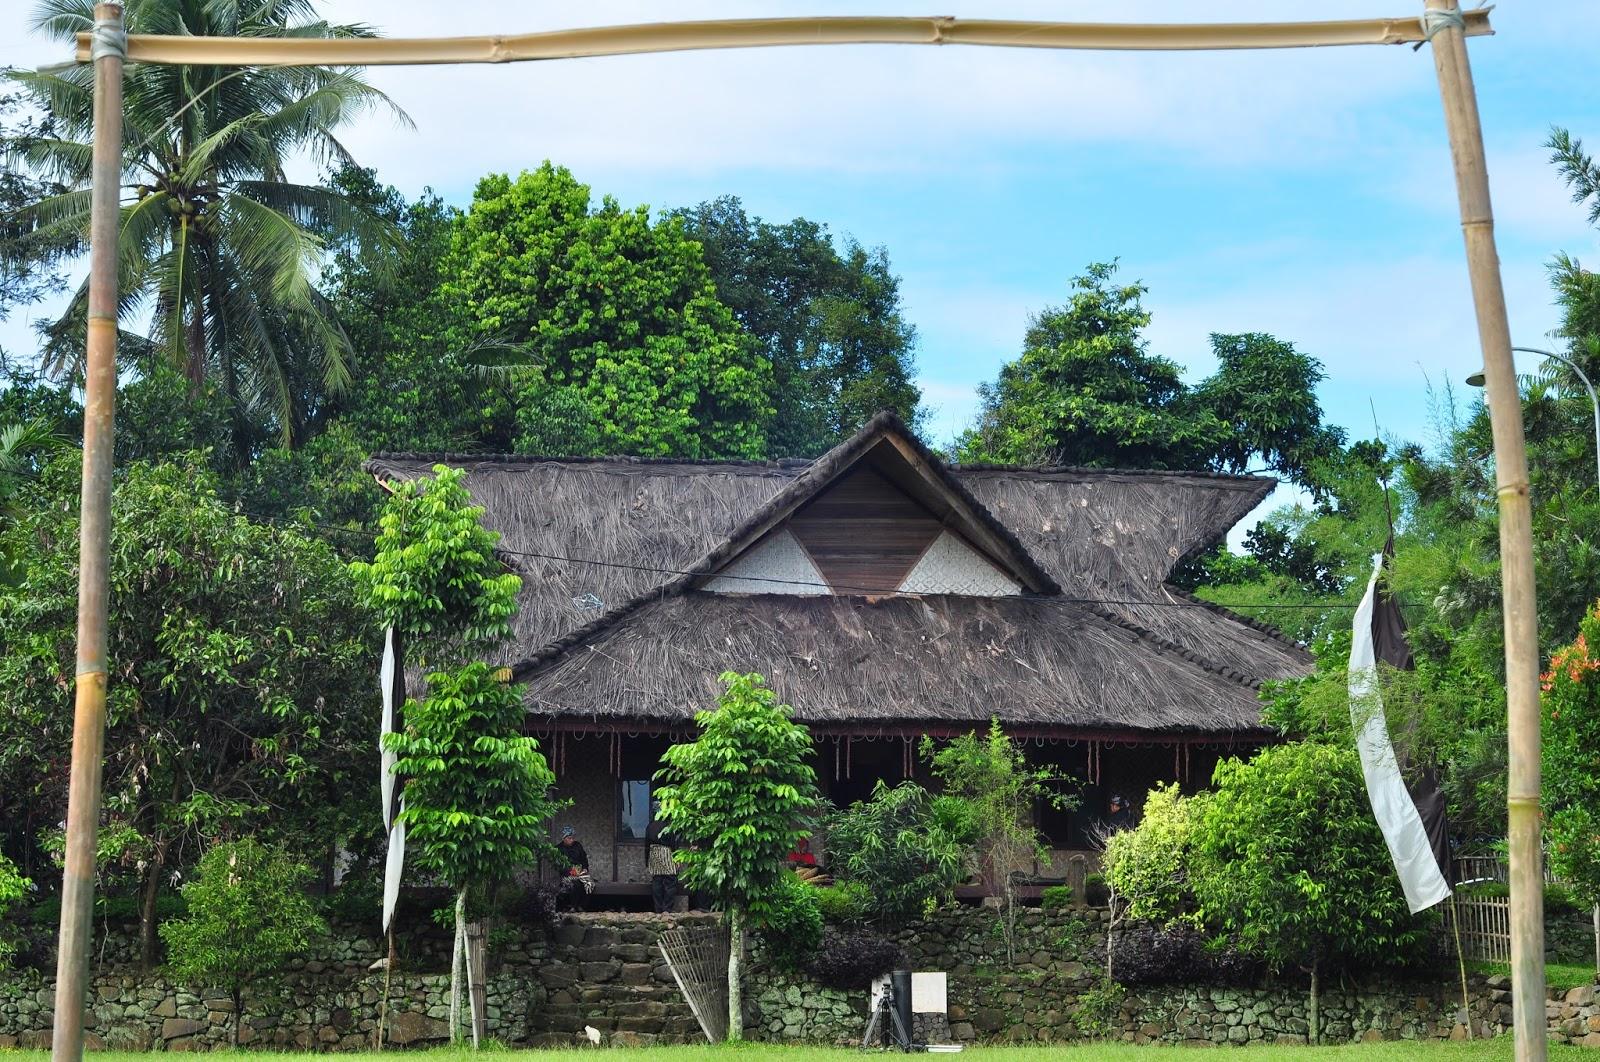 Kampung Adat Sindang Barang Dunia Kita Tertua Wilayah Kota Kab